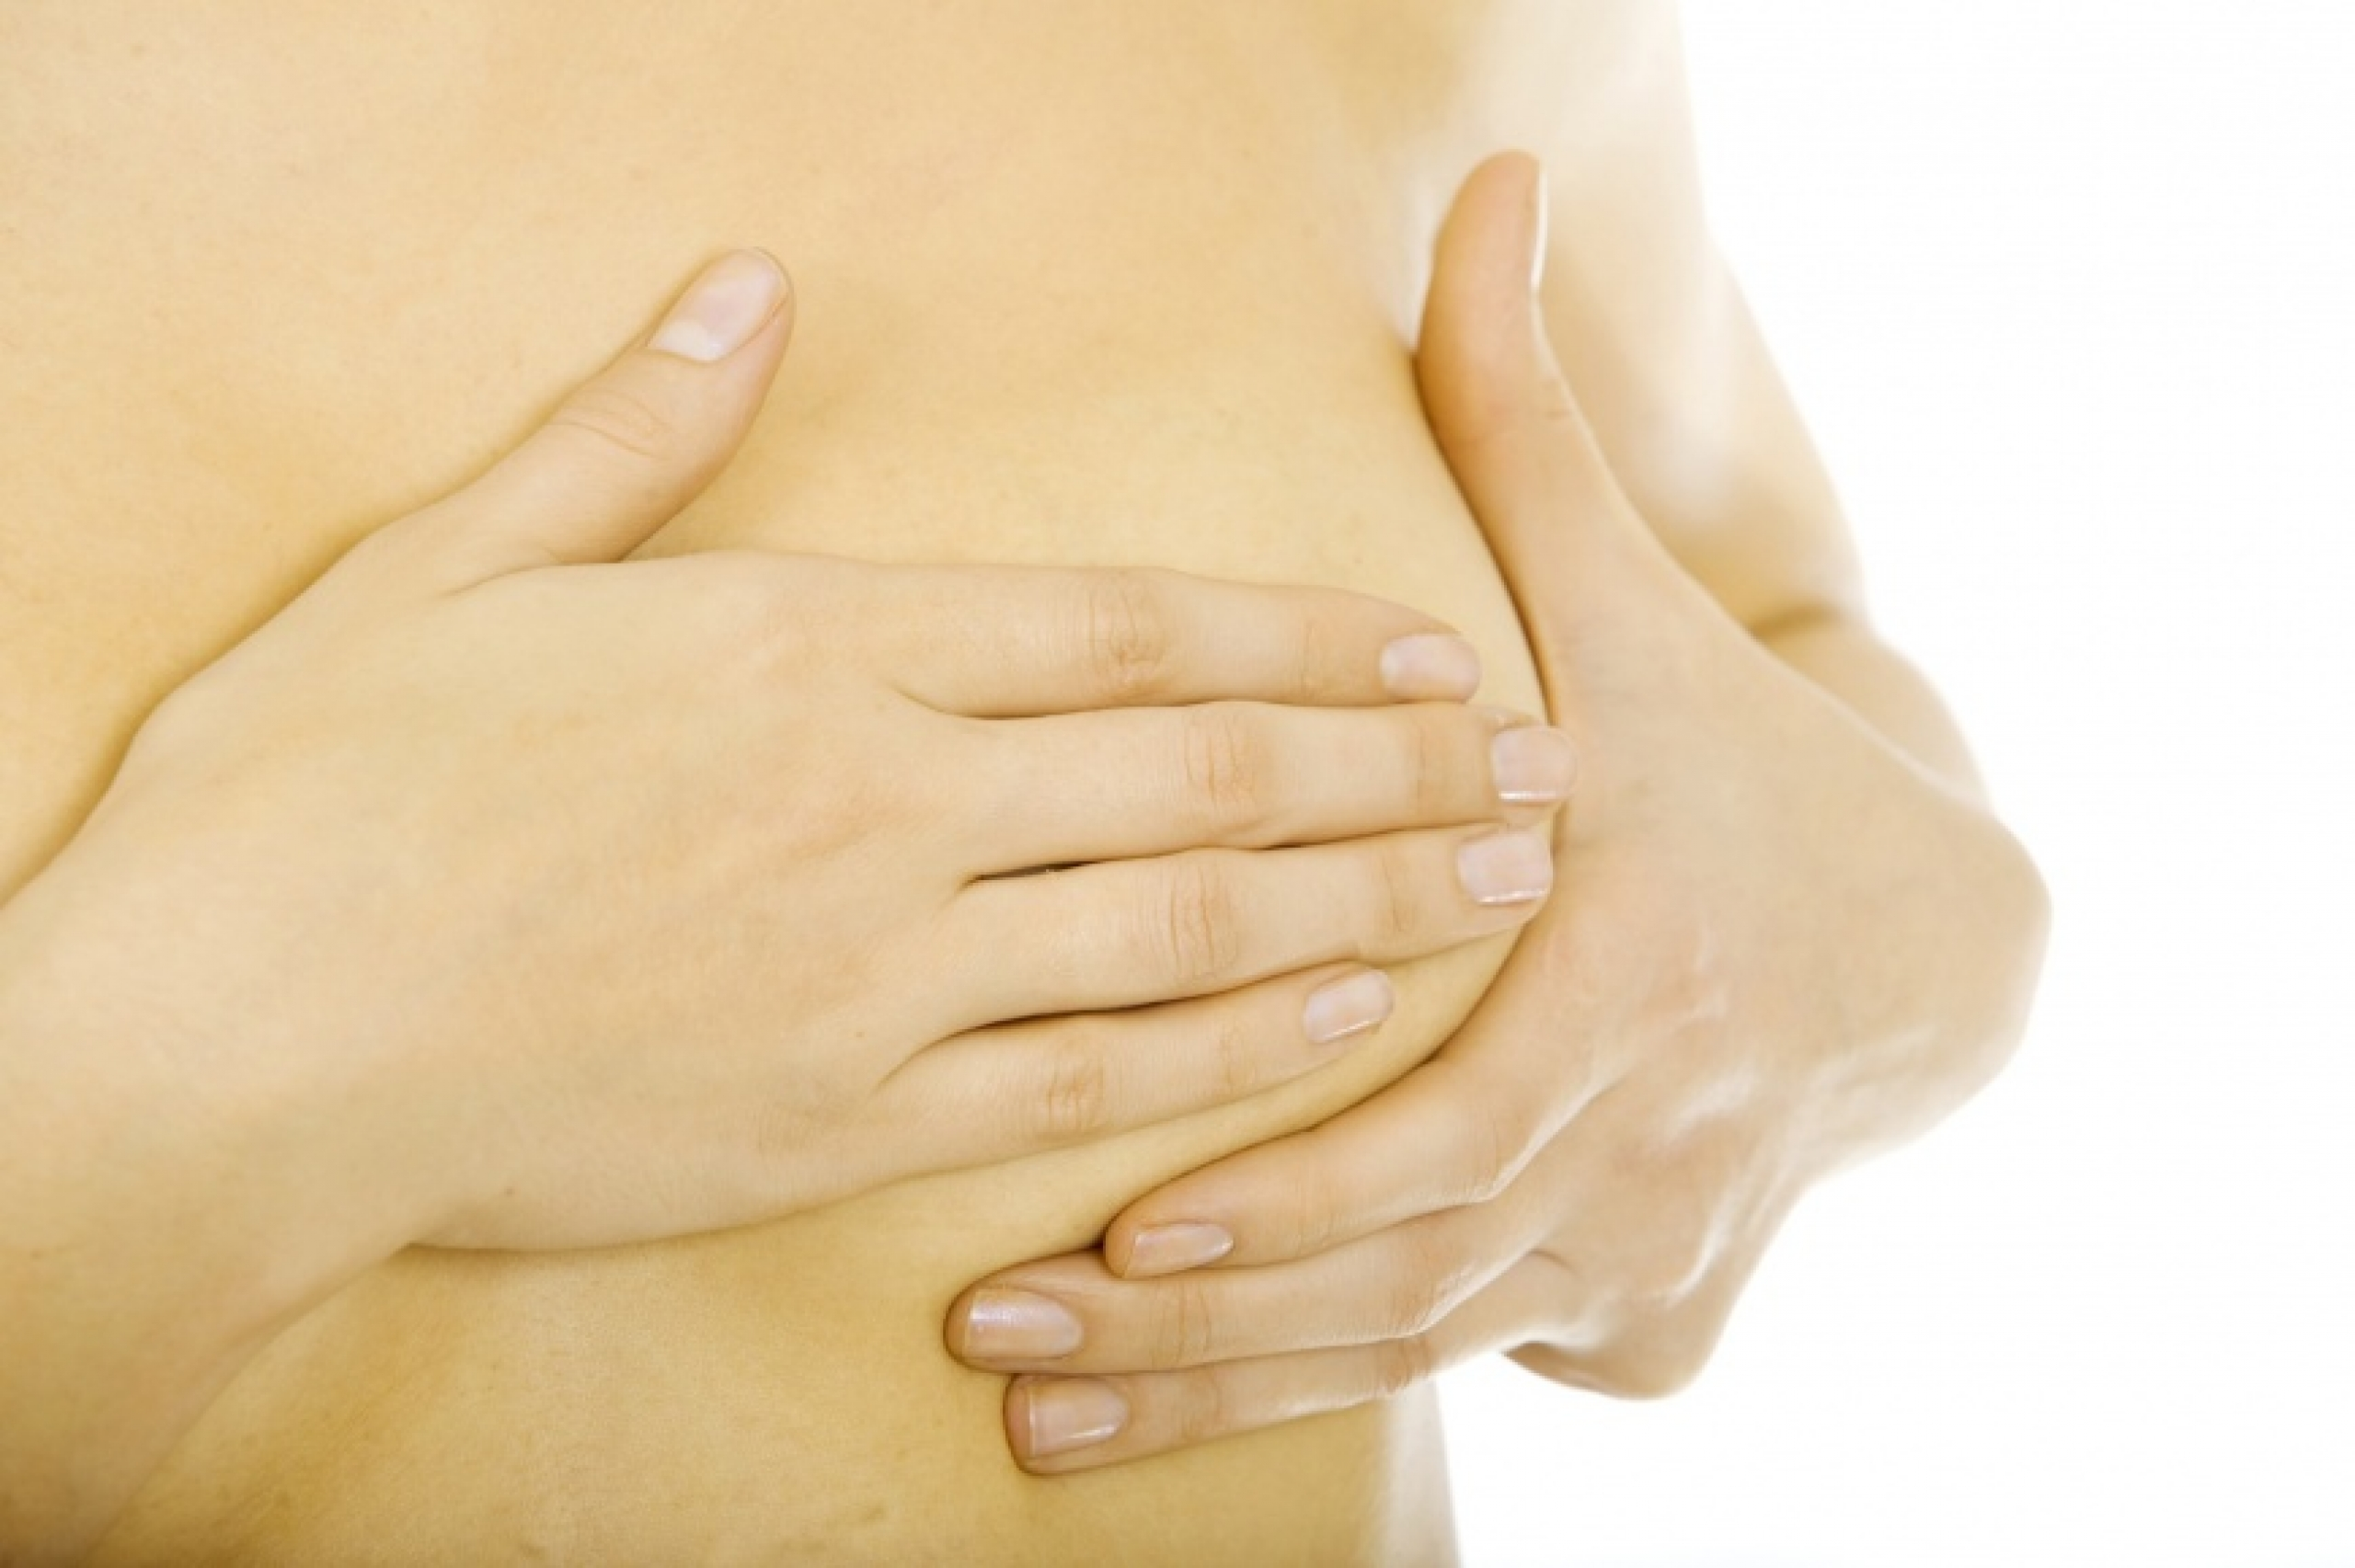 Признаки секса женской груди сосок